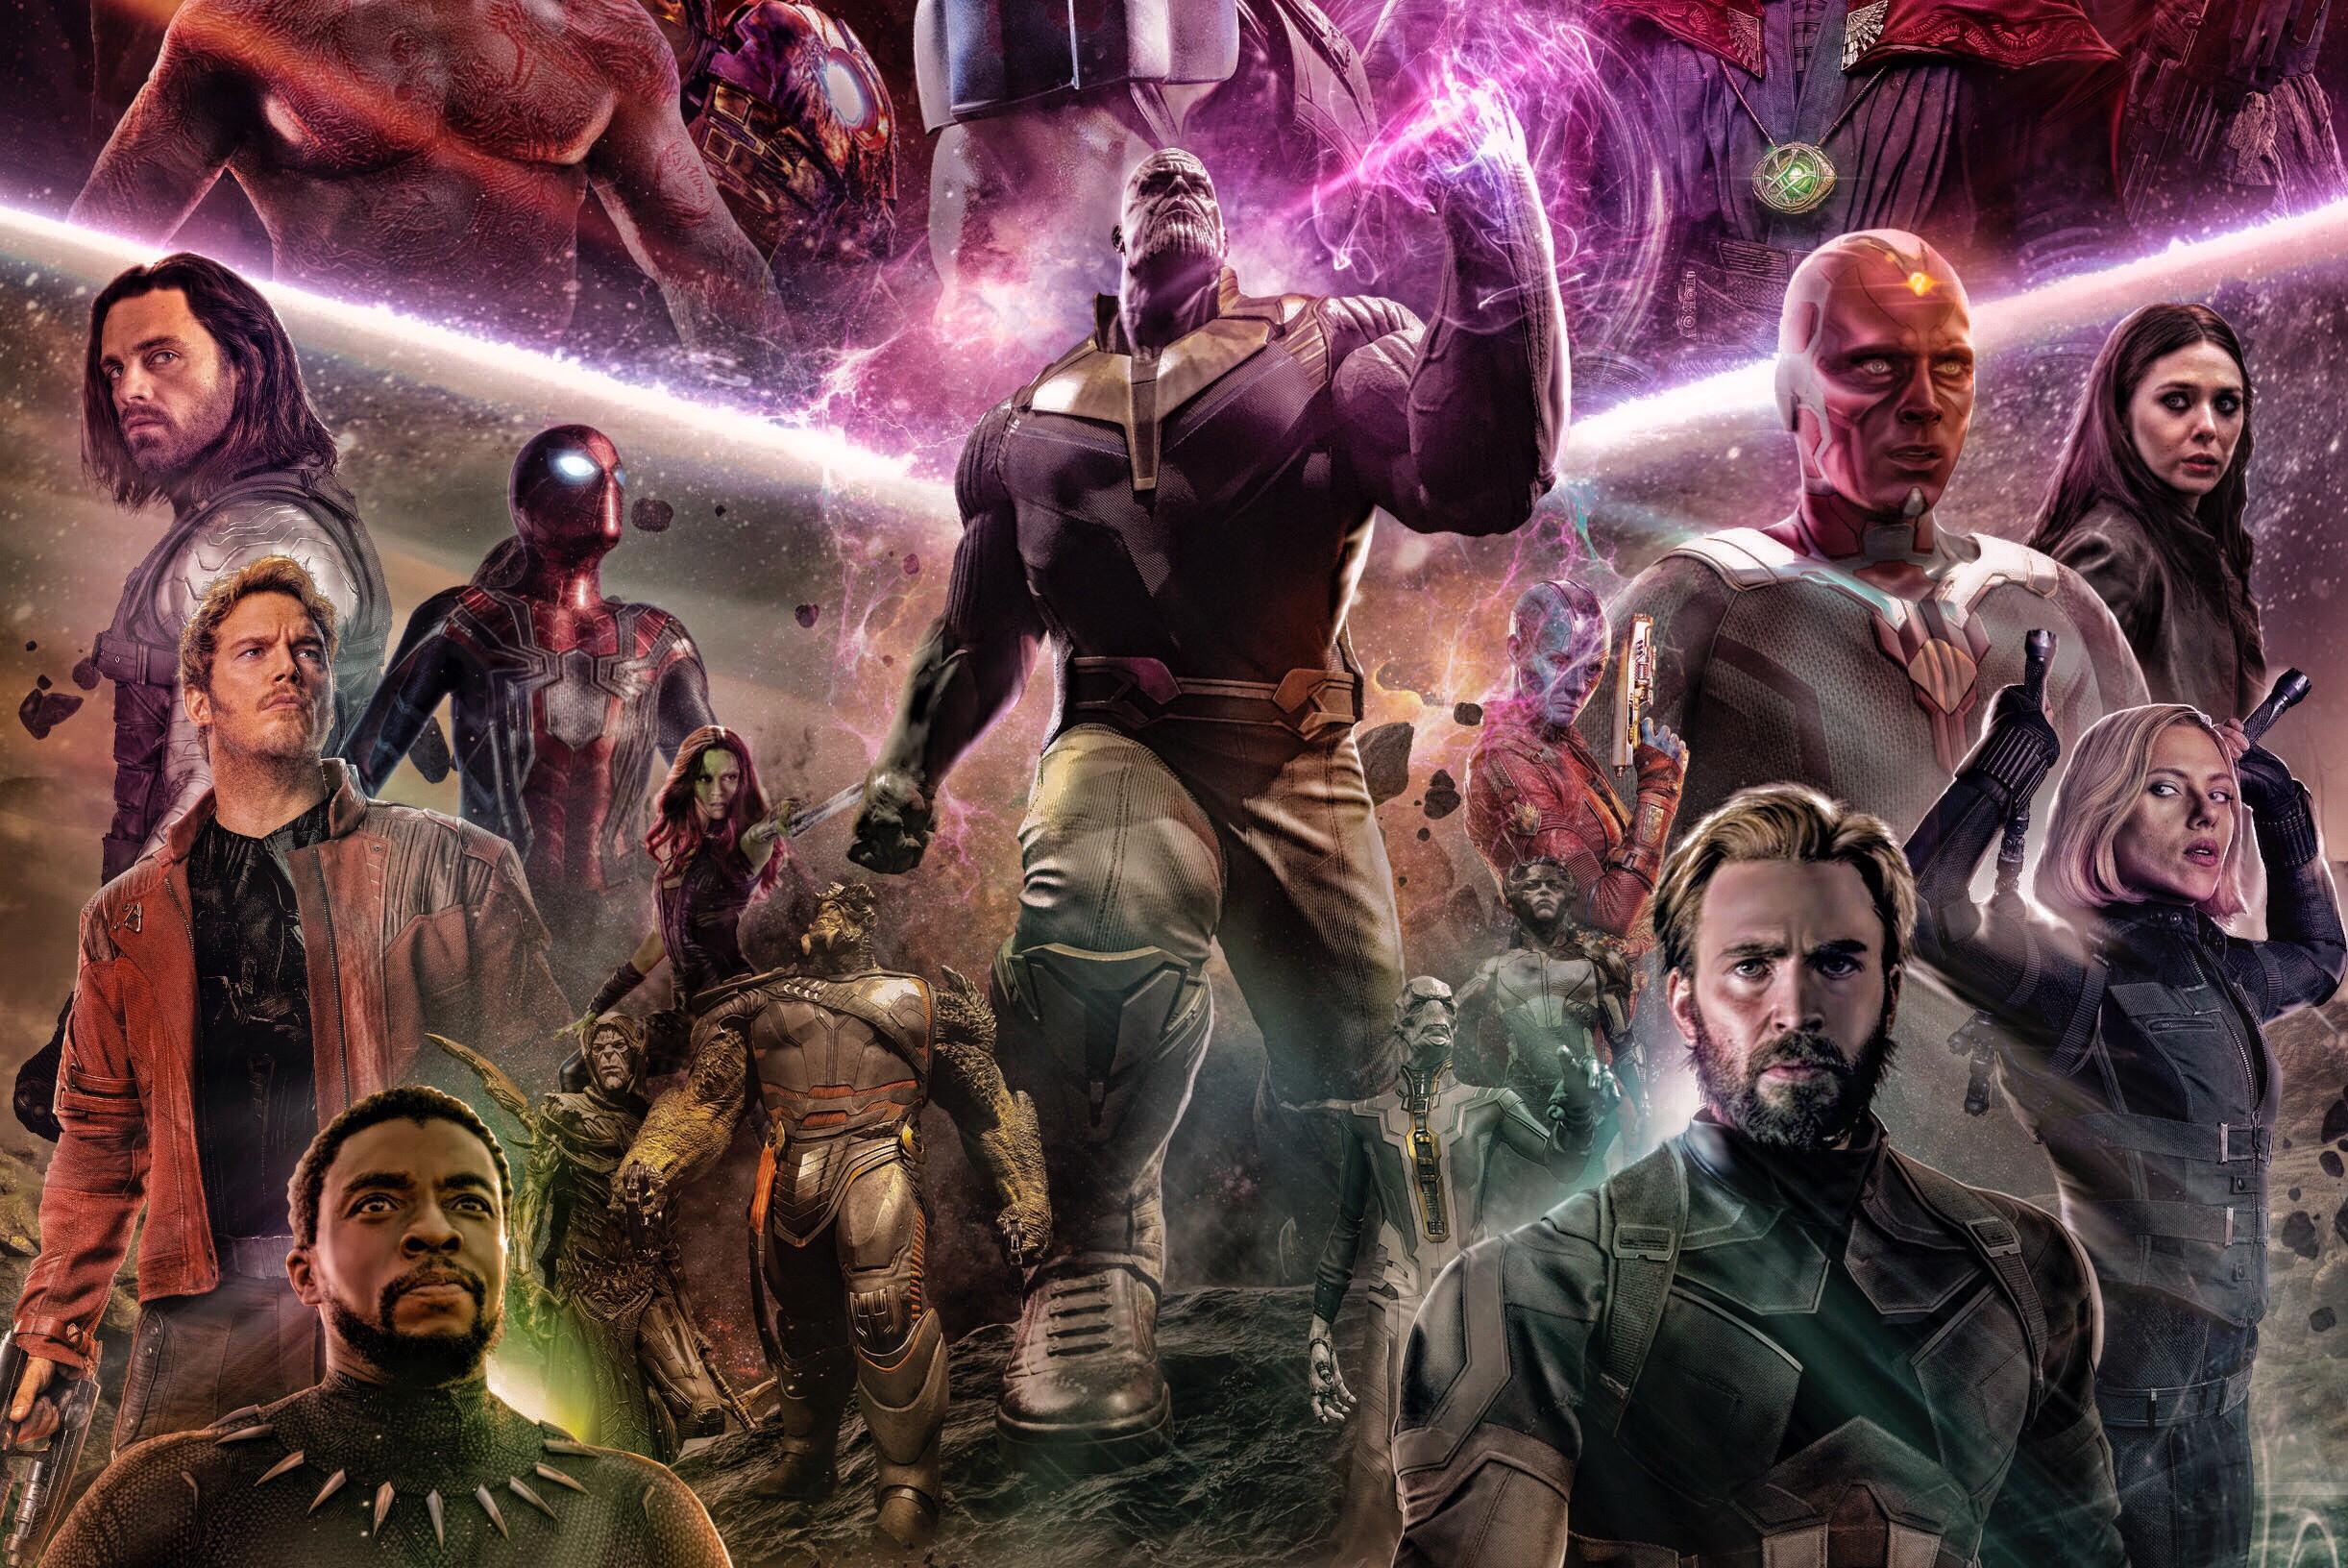 1080x1920 Avengers Infinity War 2018 Artwork Fan Made